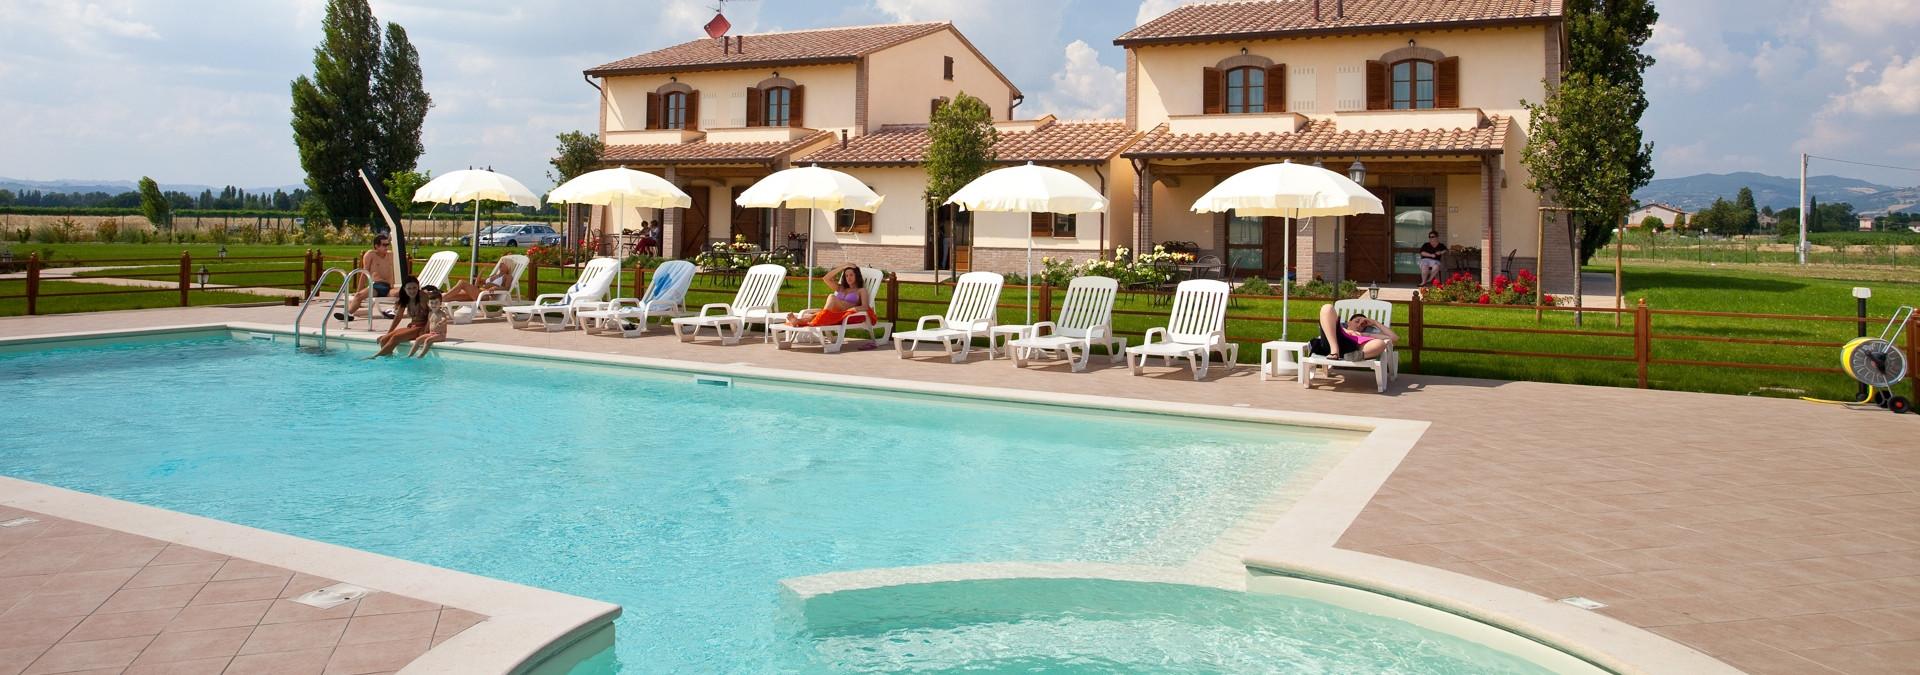 Agriturismo assisi con piscina vakantie assisi - Agriturismo con piscina in umbria ...